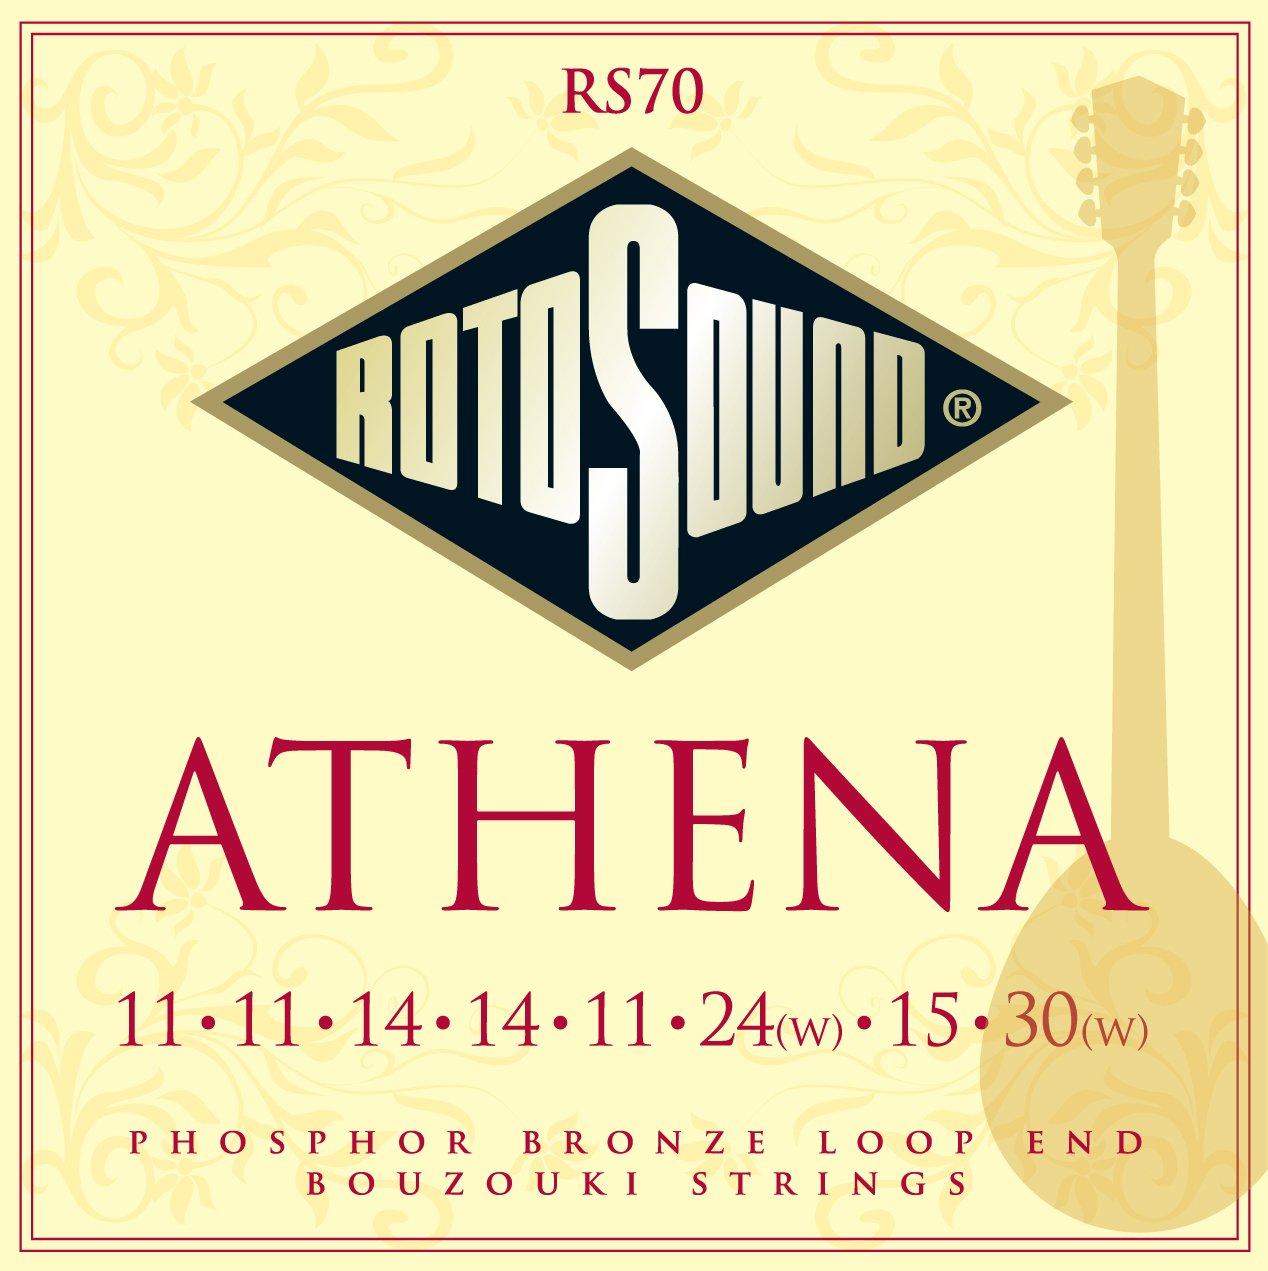 Rotosound RS70 Athena Phosphor Bronze Loop End 8 String Bouzouki Strings